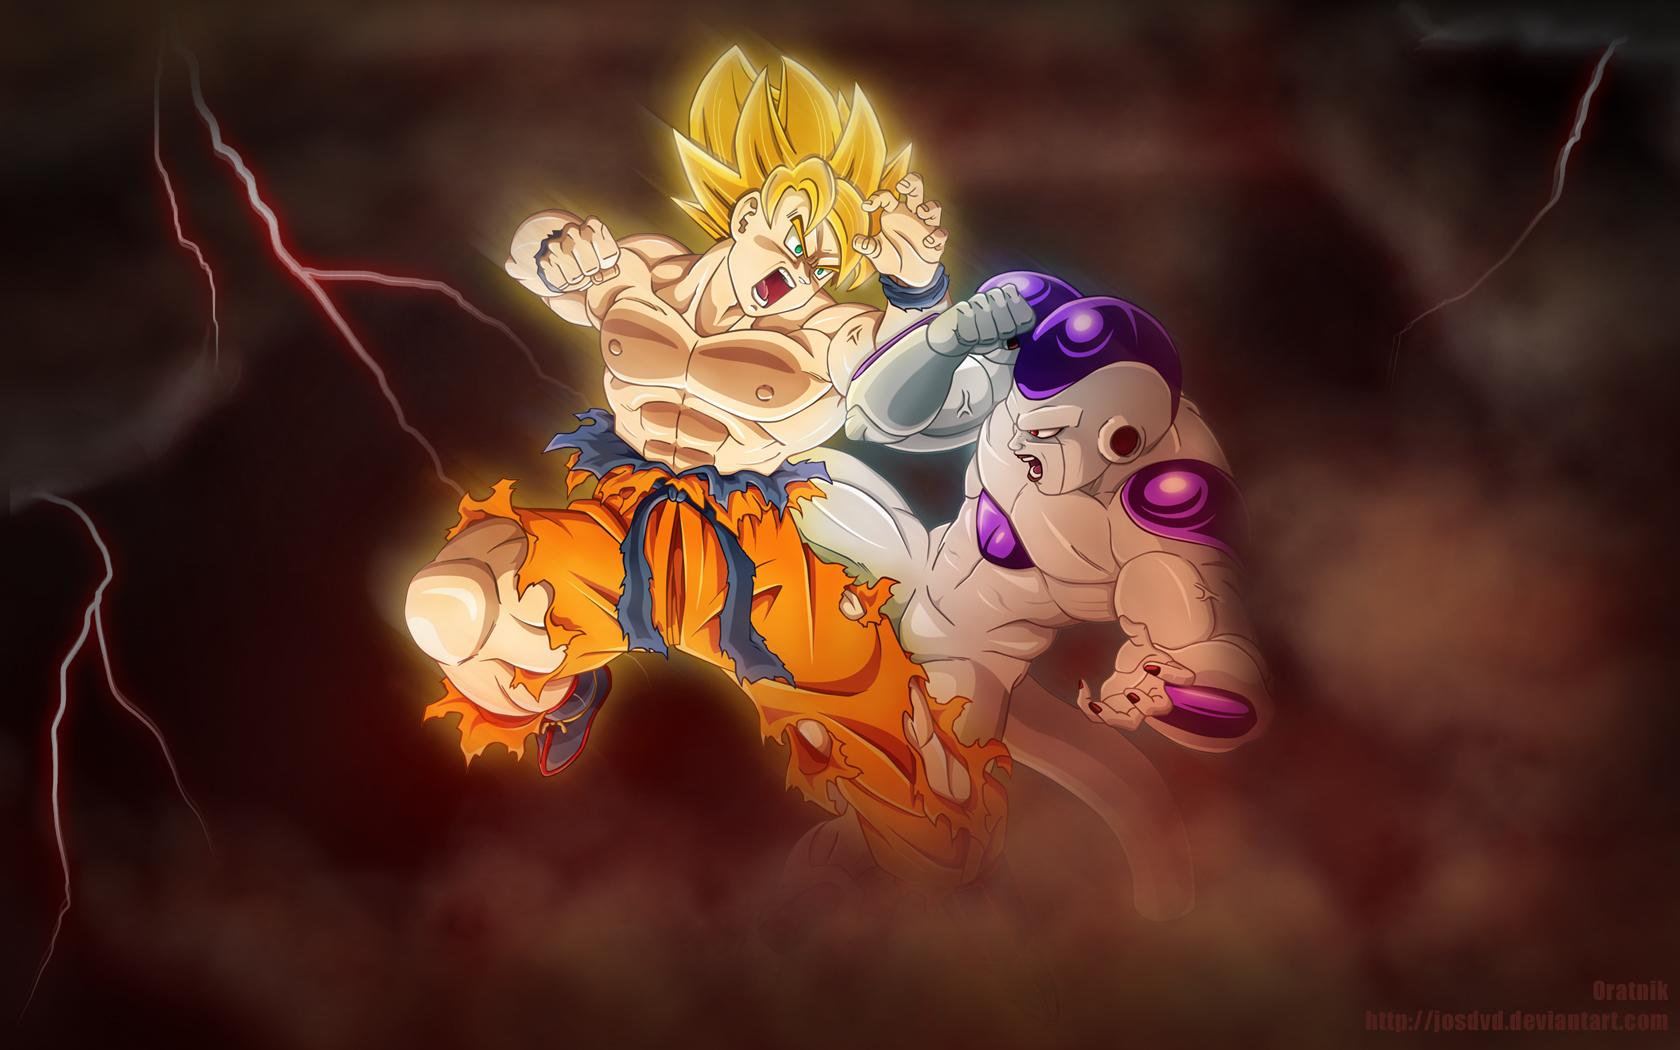 Son Goku Wallpaper 1680x1050 Son Goku Frieza Dragon Ball Z 1680x1050